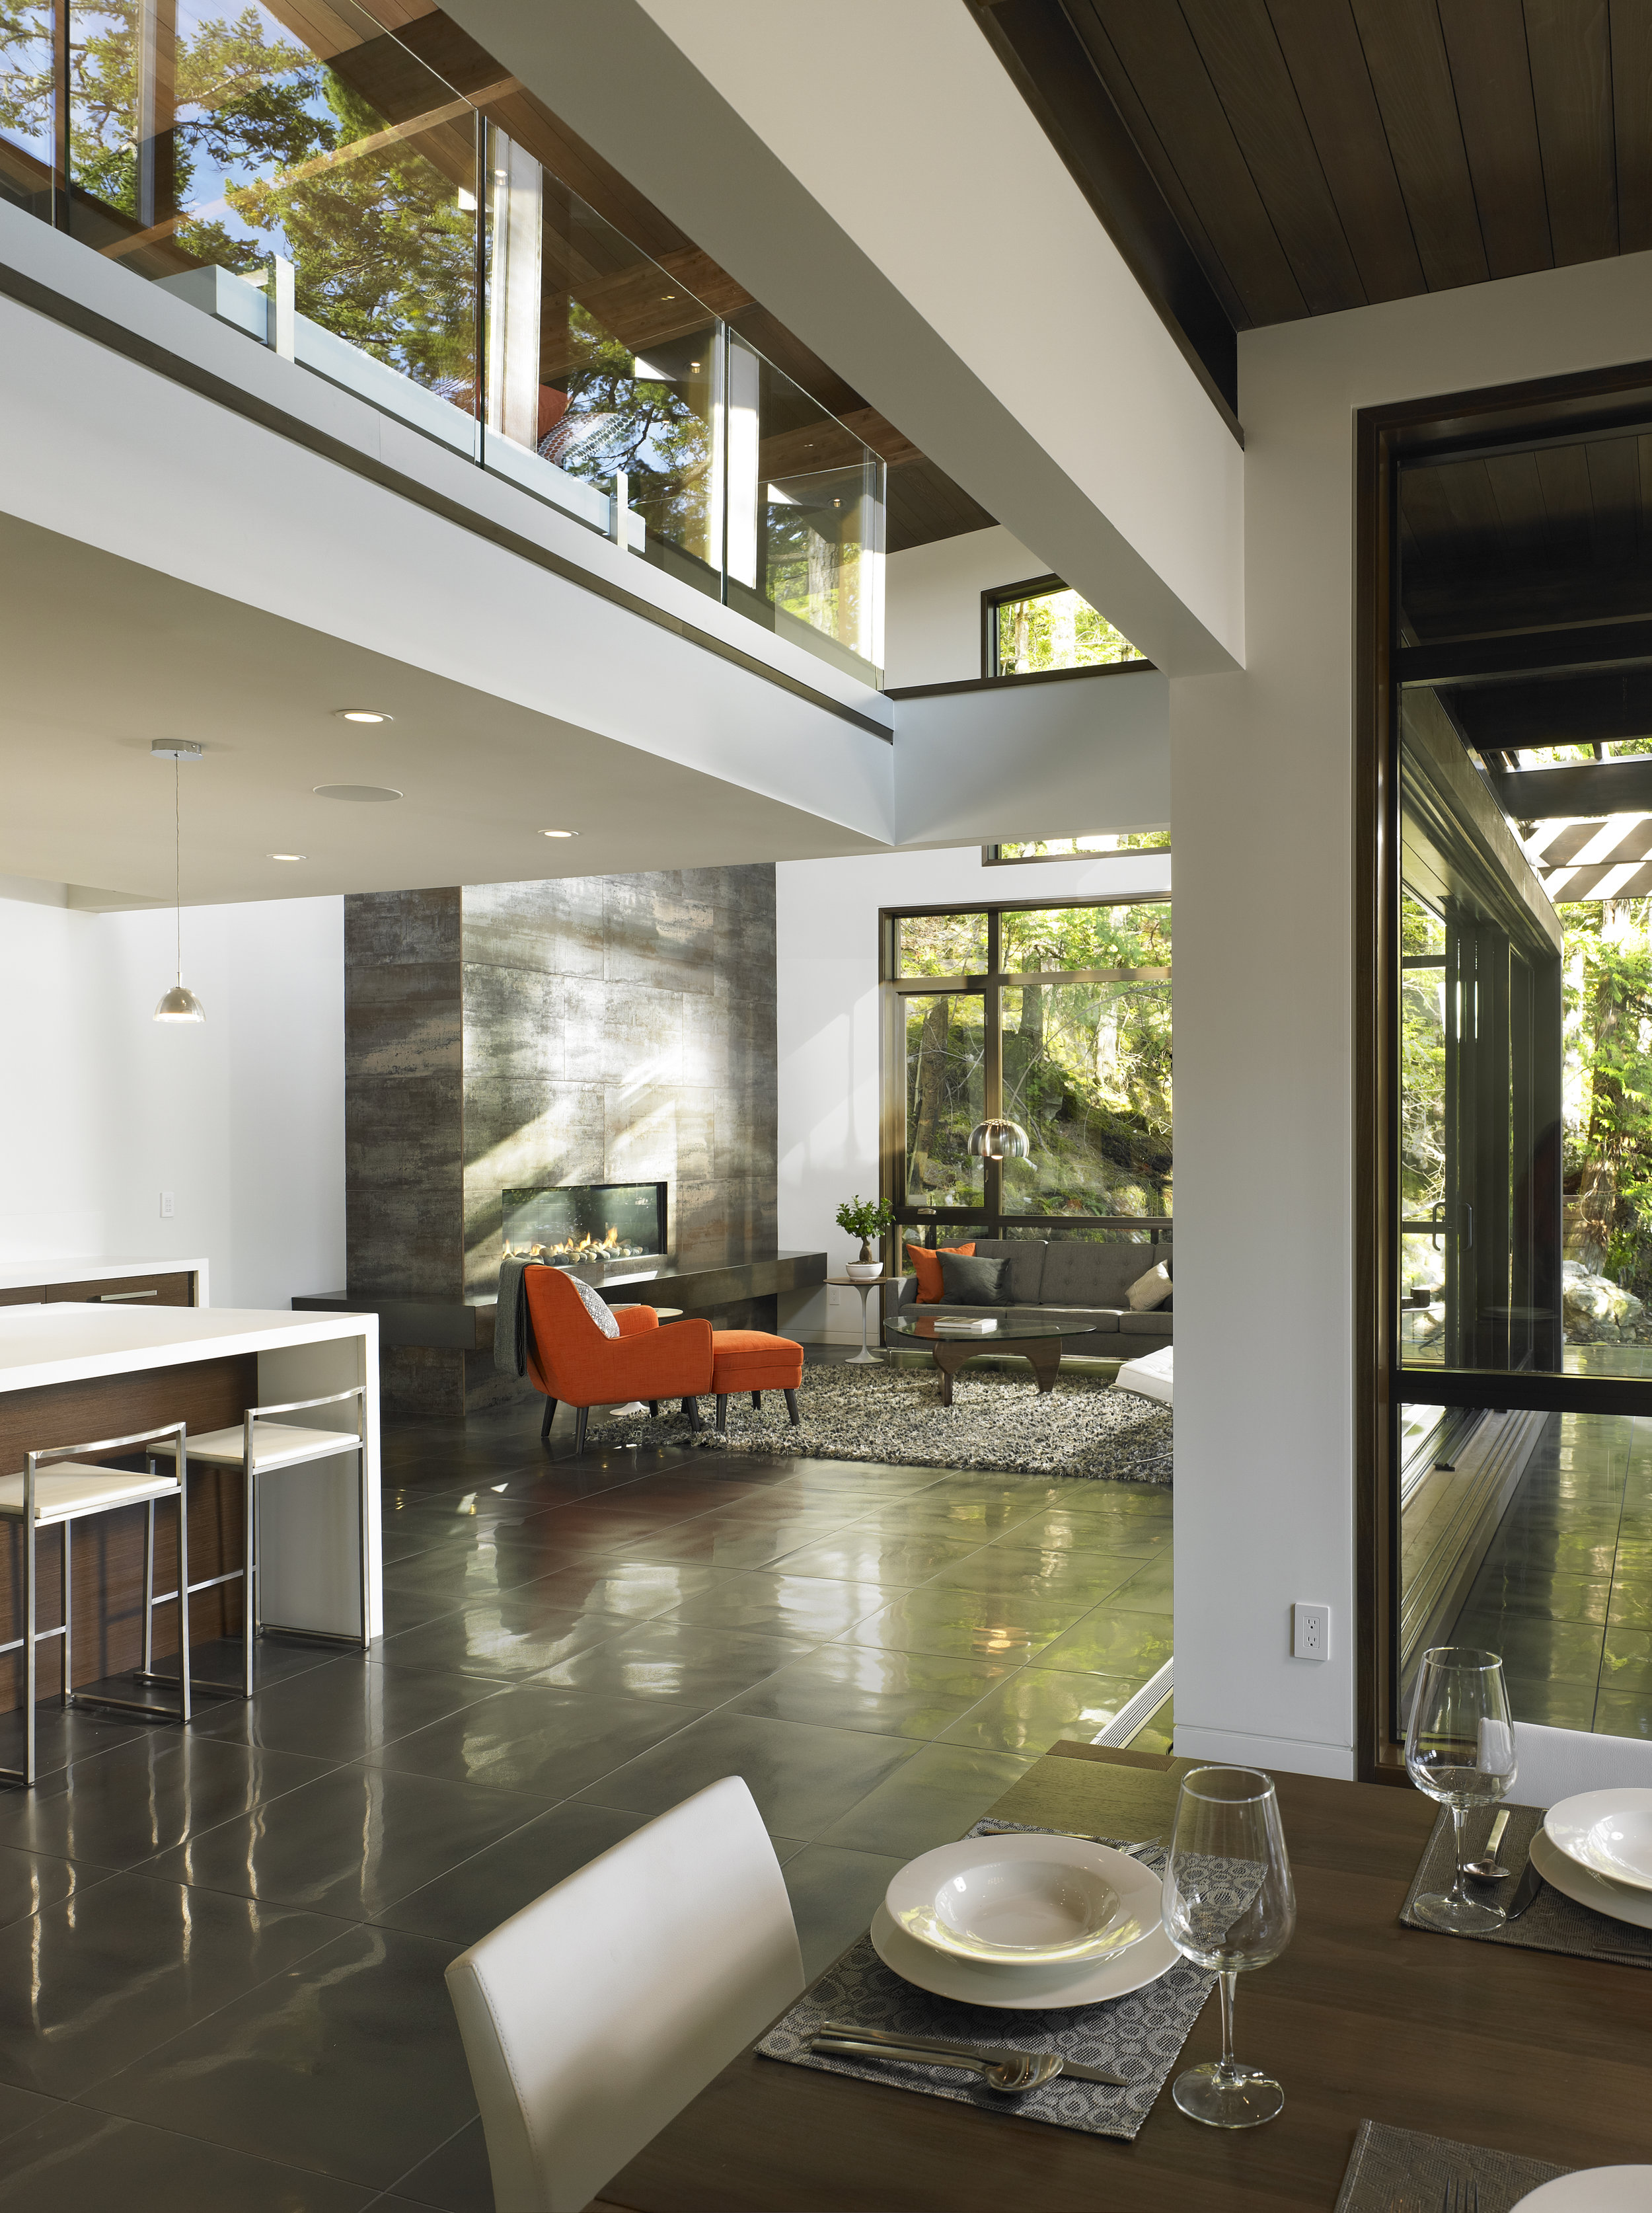 turkel_modern_design_prefab_gambier_island_house_great_room_interior.jpg